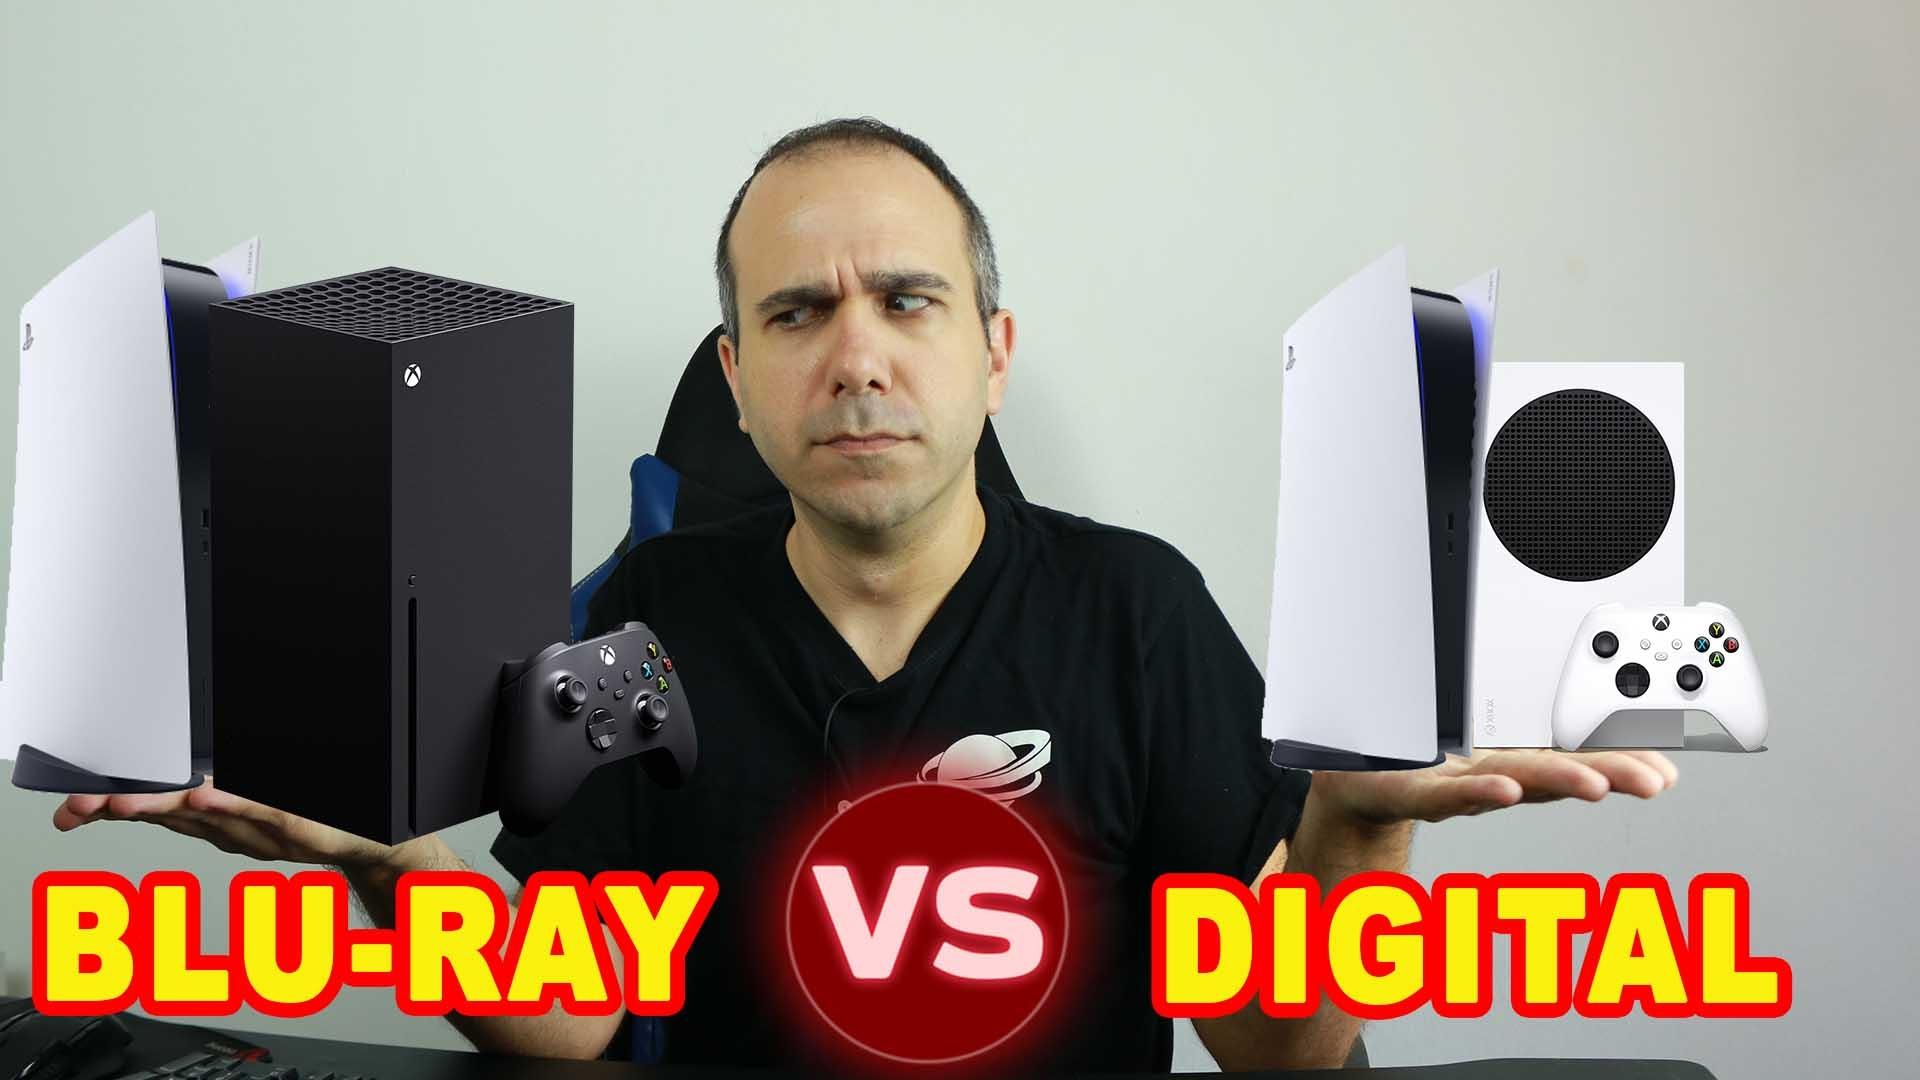 Editorial 22: Αγορά Digital κονσόλας ή με blu-ray drive